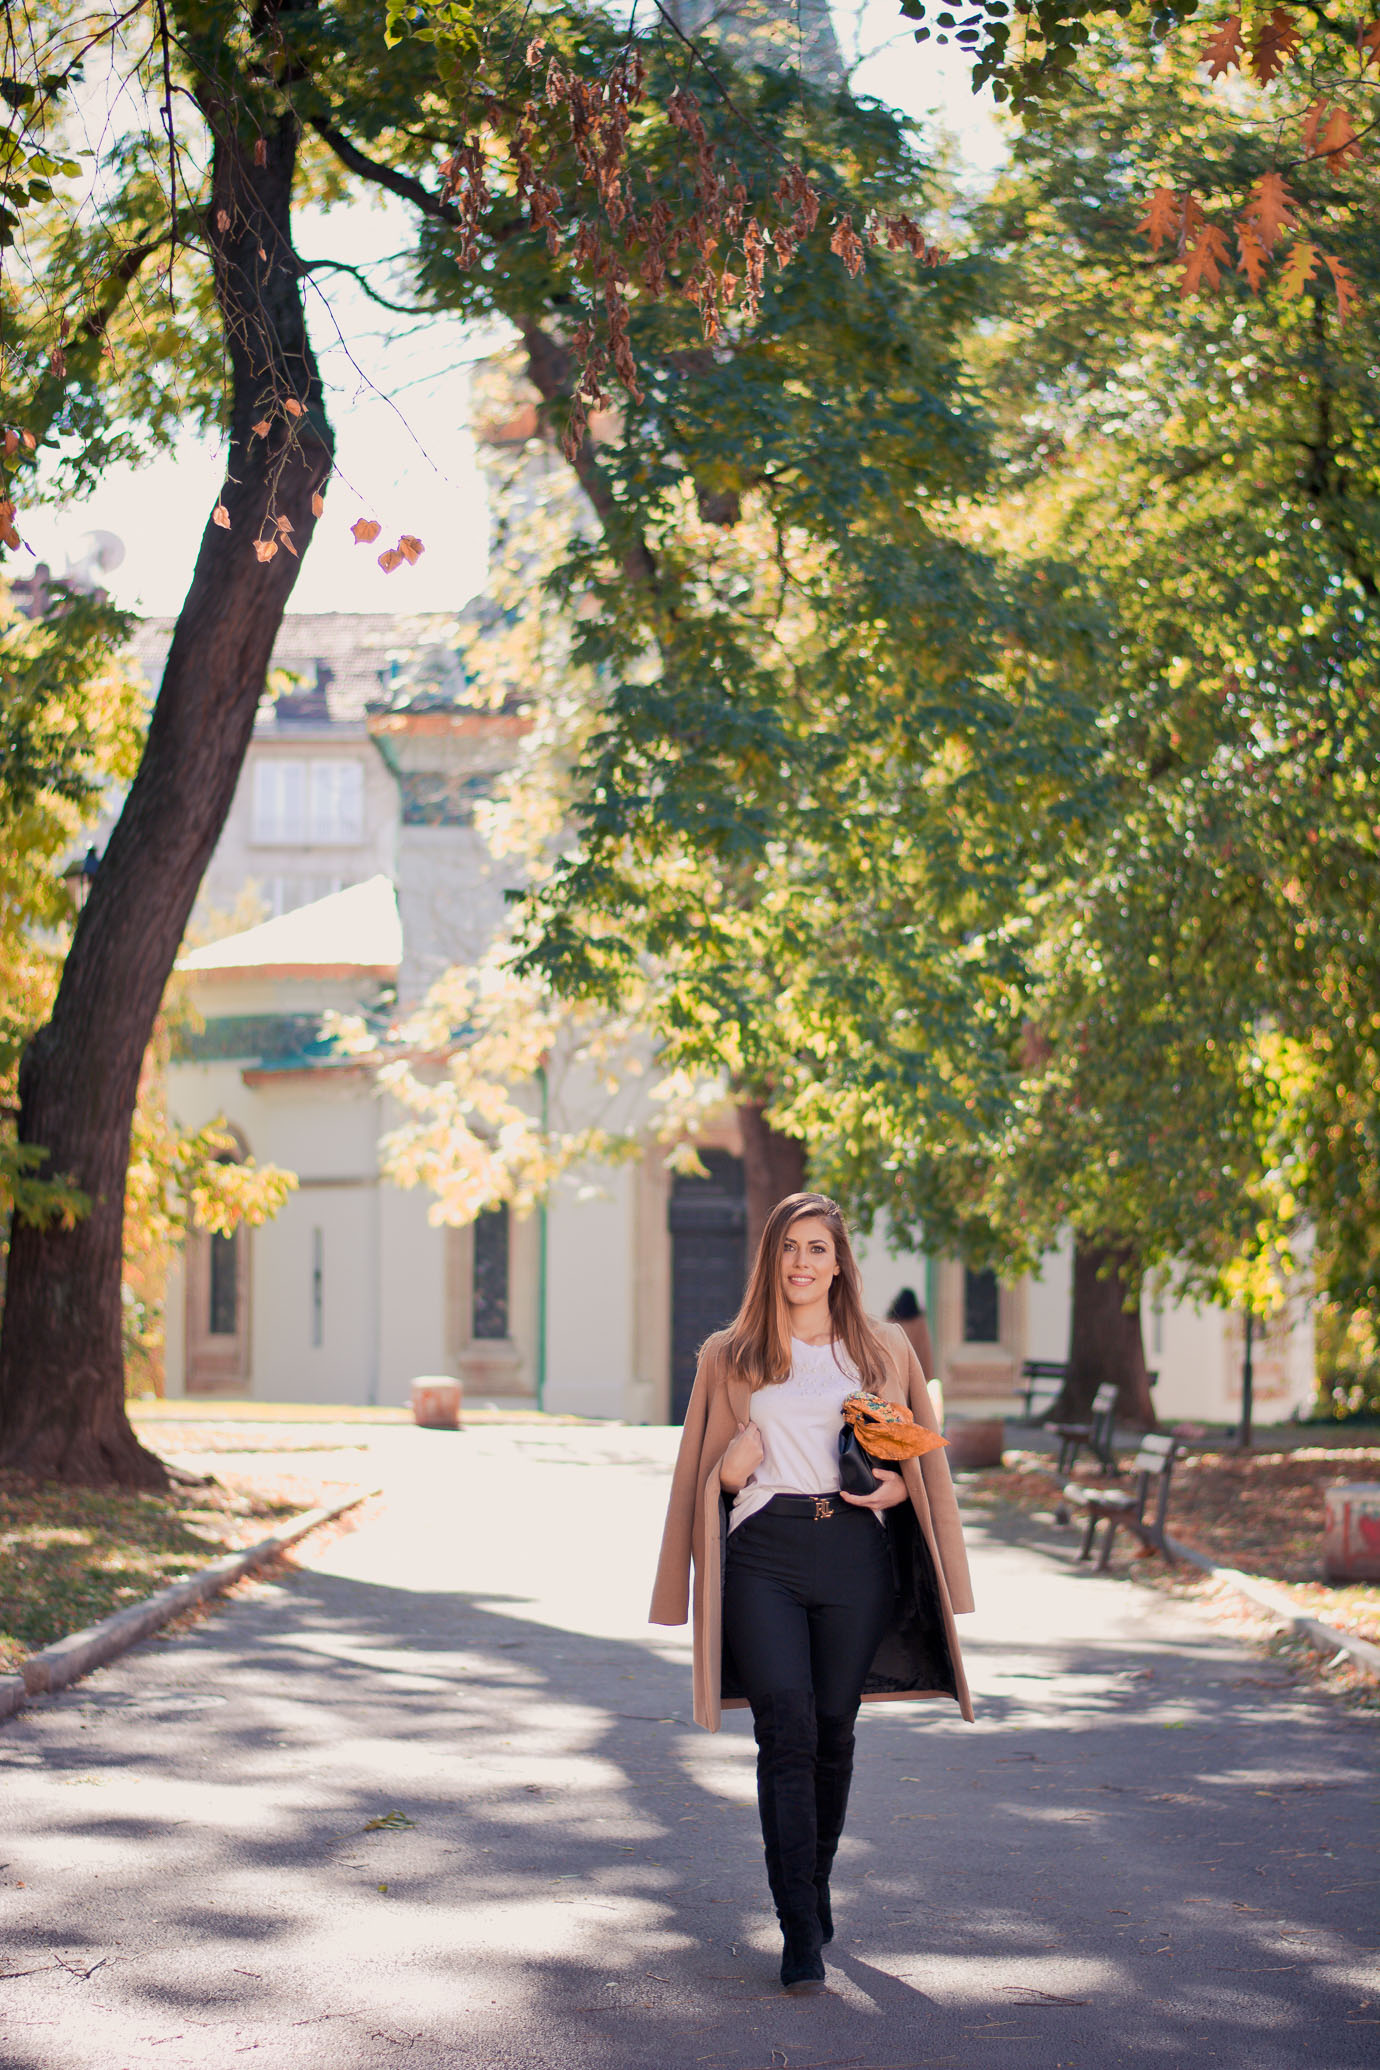 Bulgarian blogger Estee Lauder